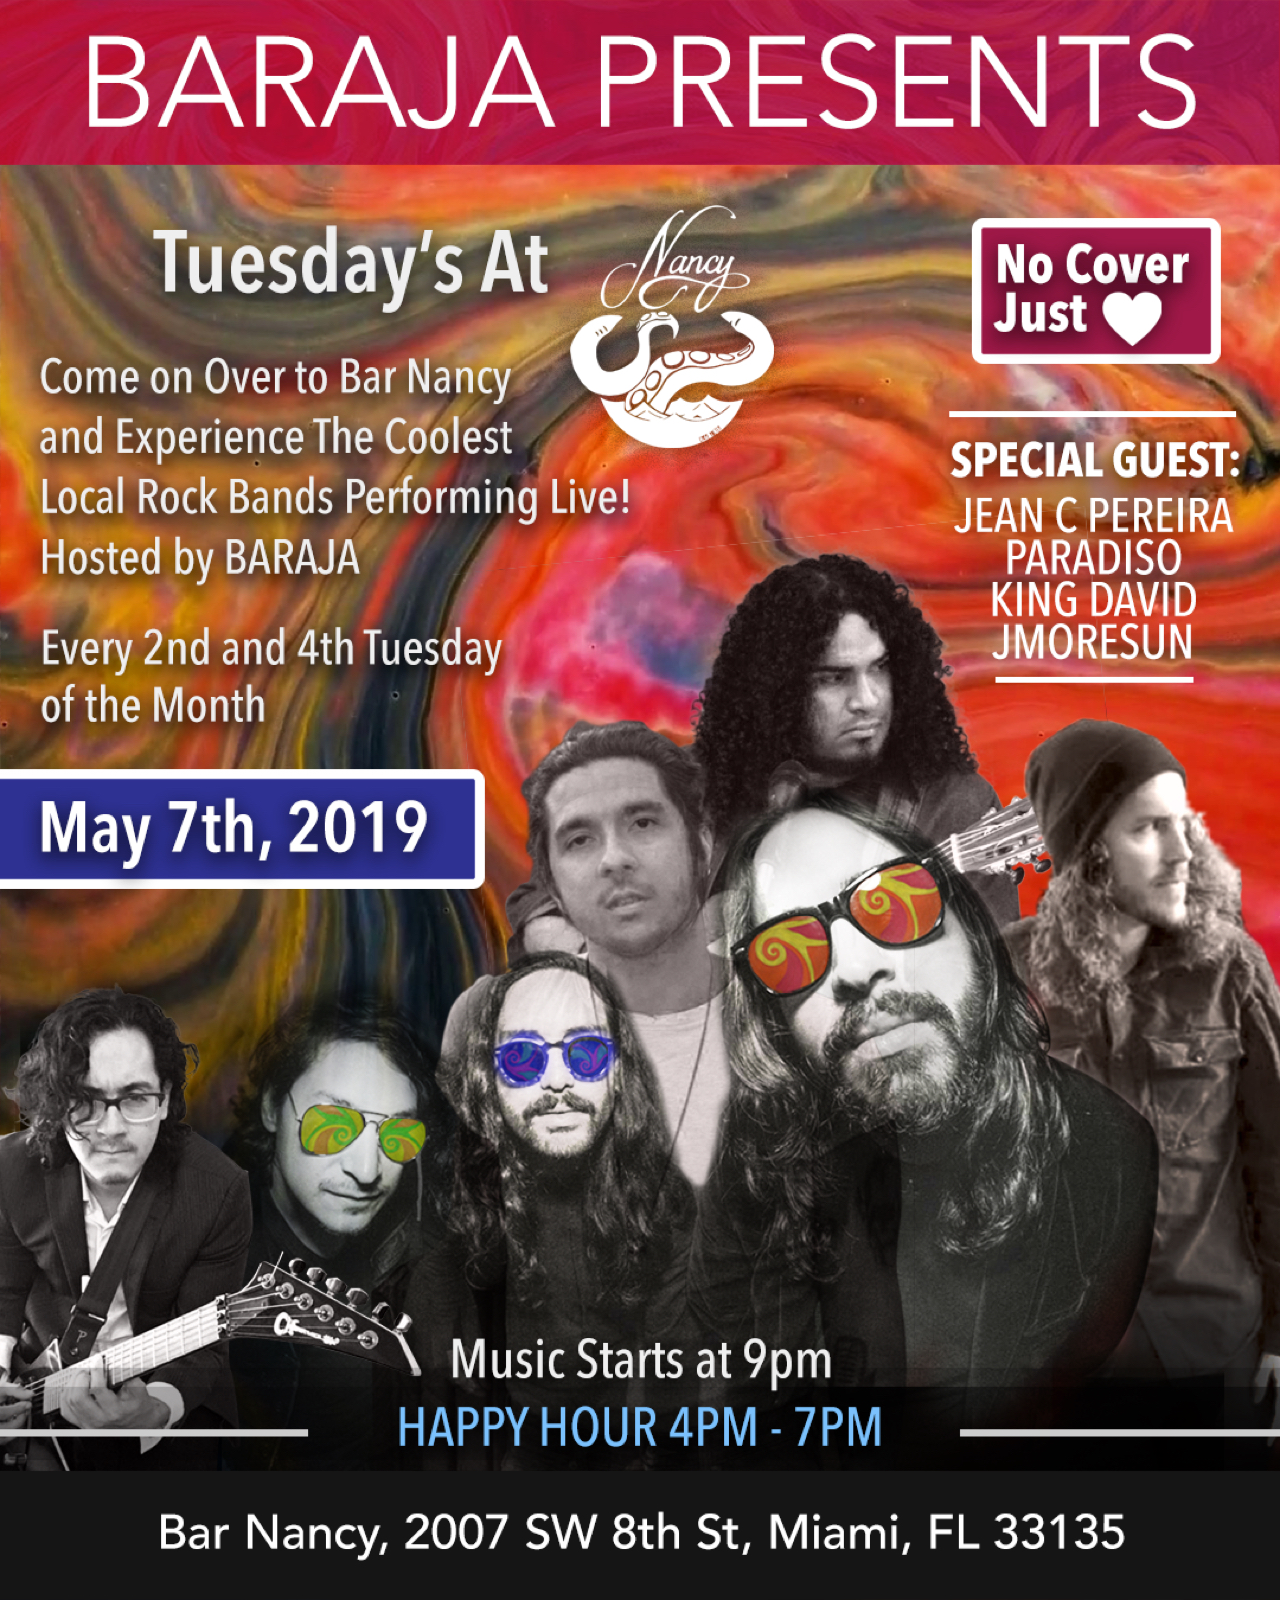 Baraja Presents Tuesday's at Bar Nancy!